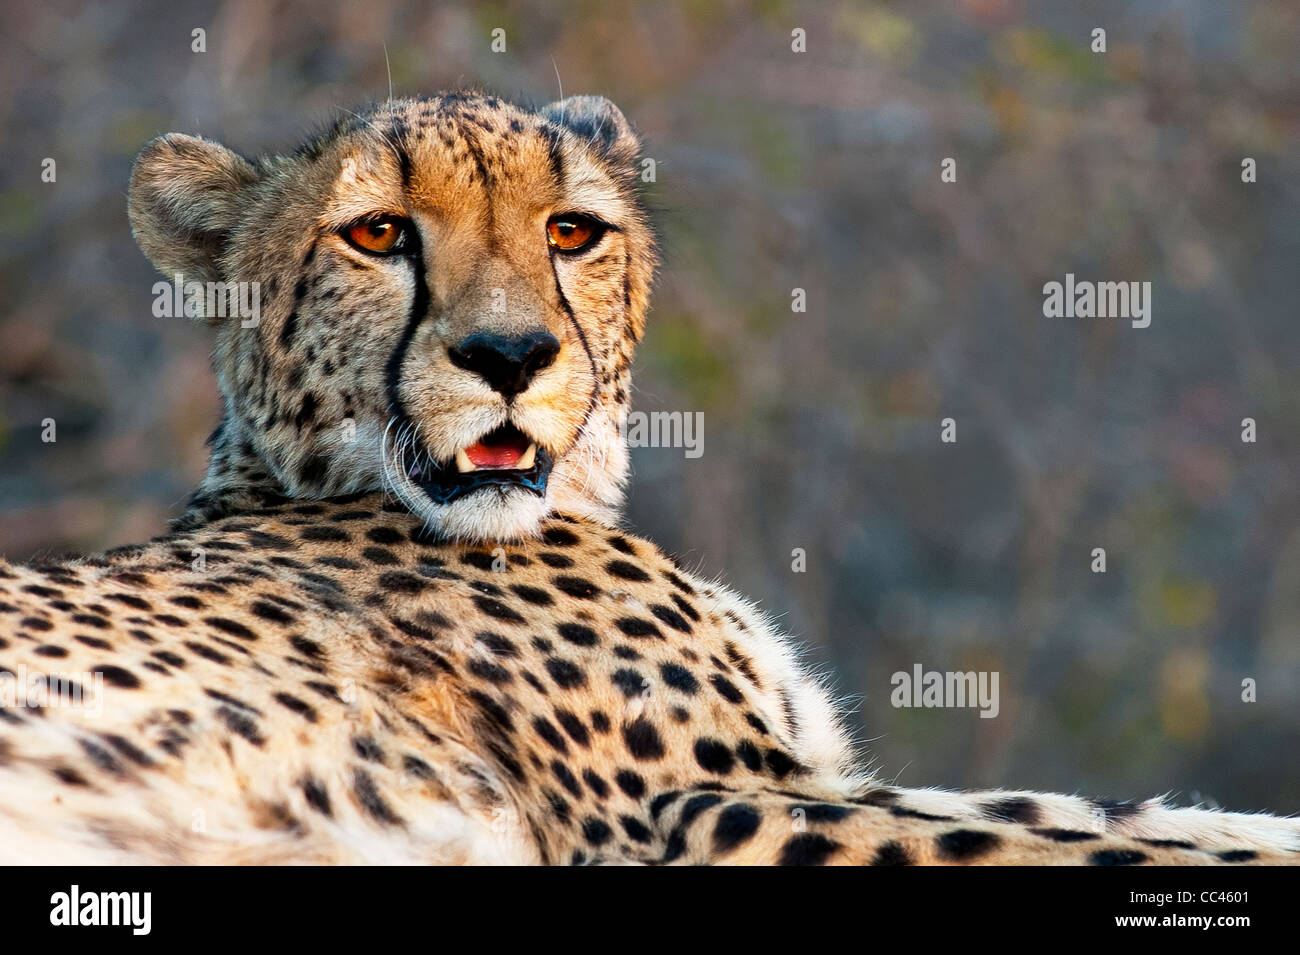 Primer plano de un leopardo descansando al atardecer Imagen De Stock